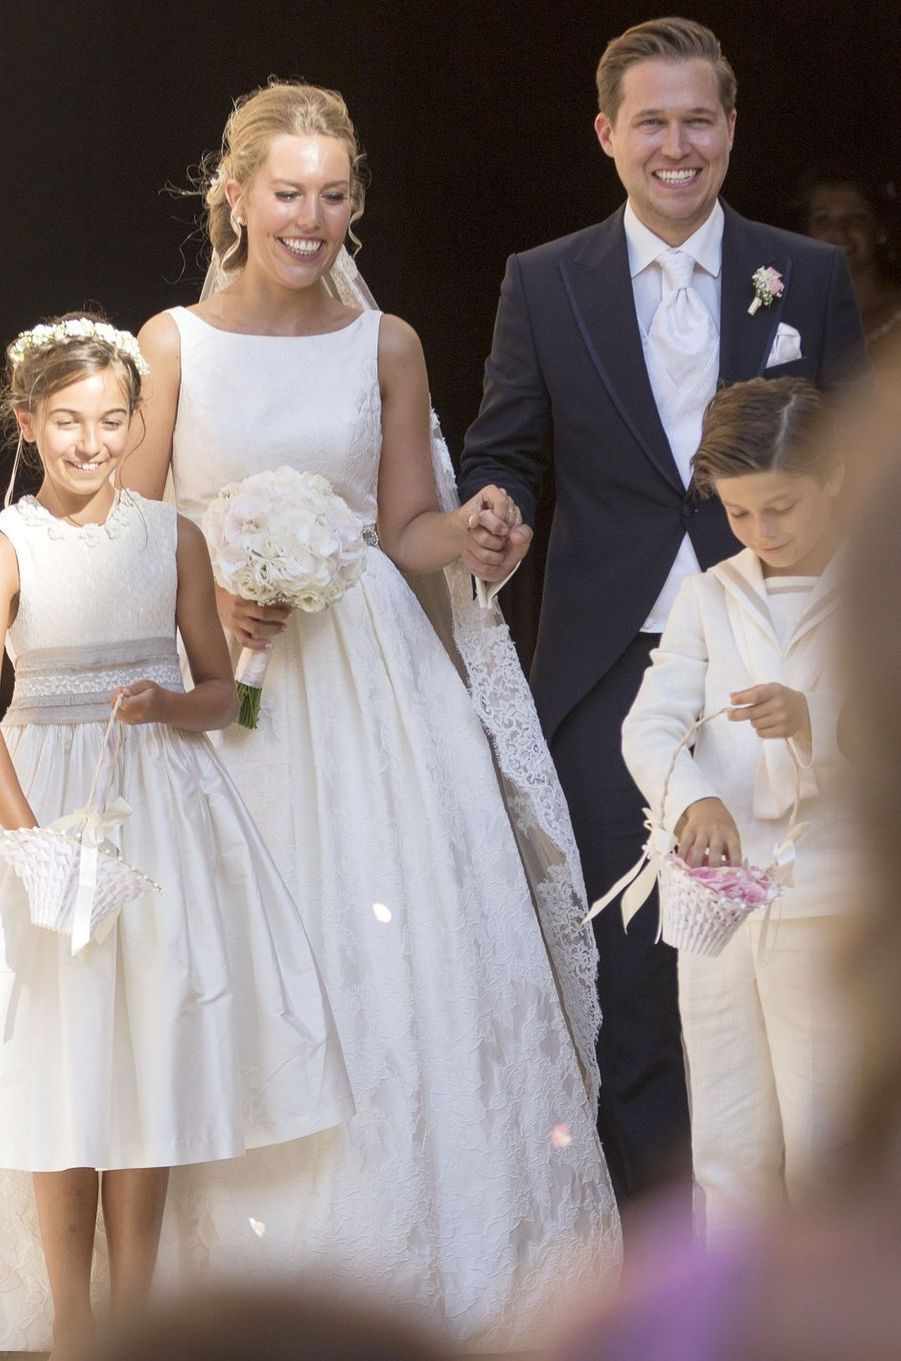 Helena Christina Sommerlath et son mari Ian Martín à Palma de Majorque, le 5 août 2017